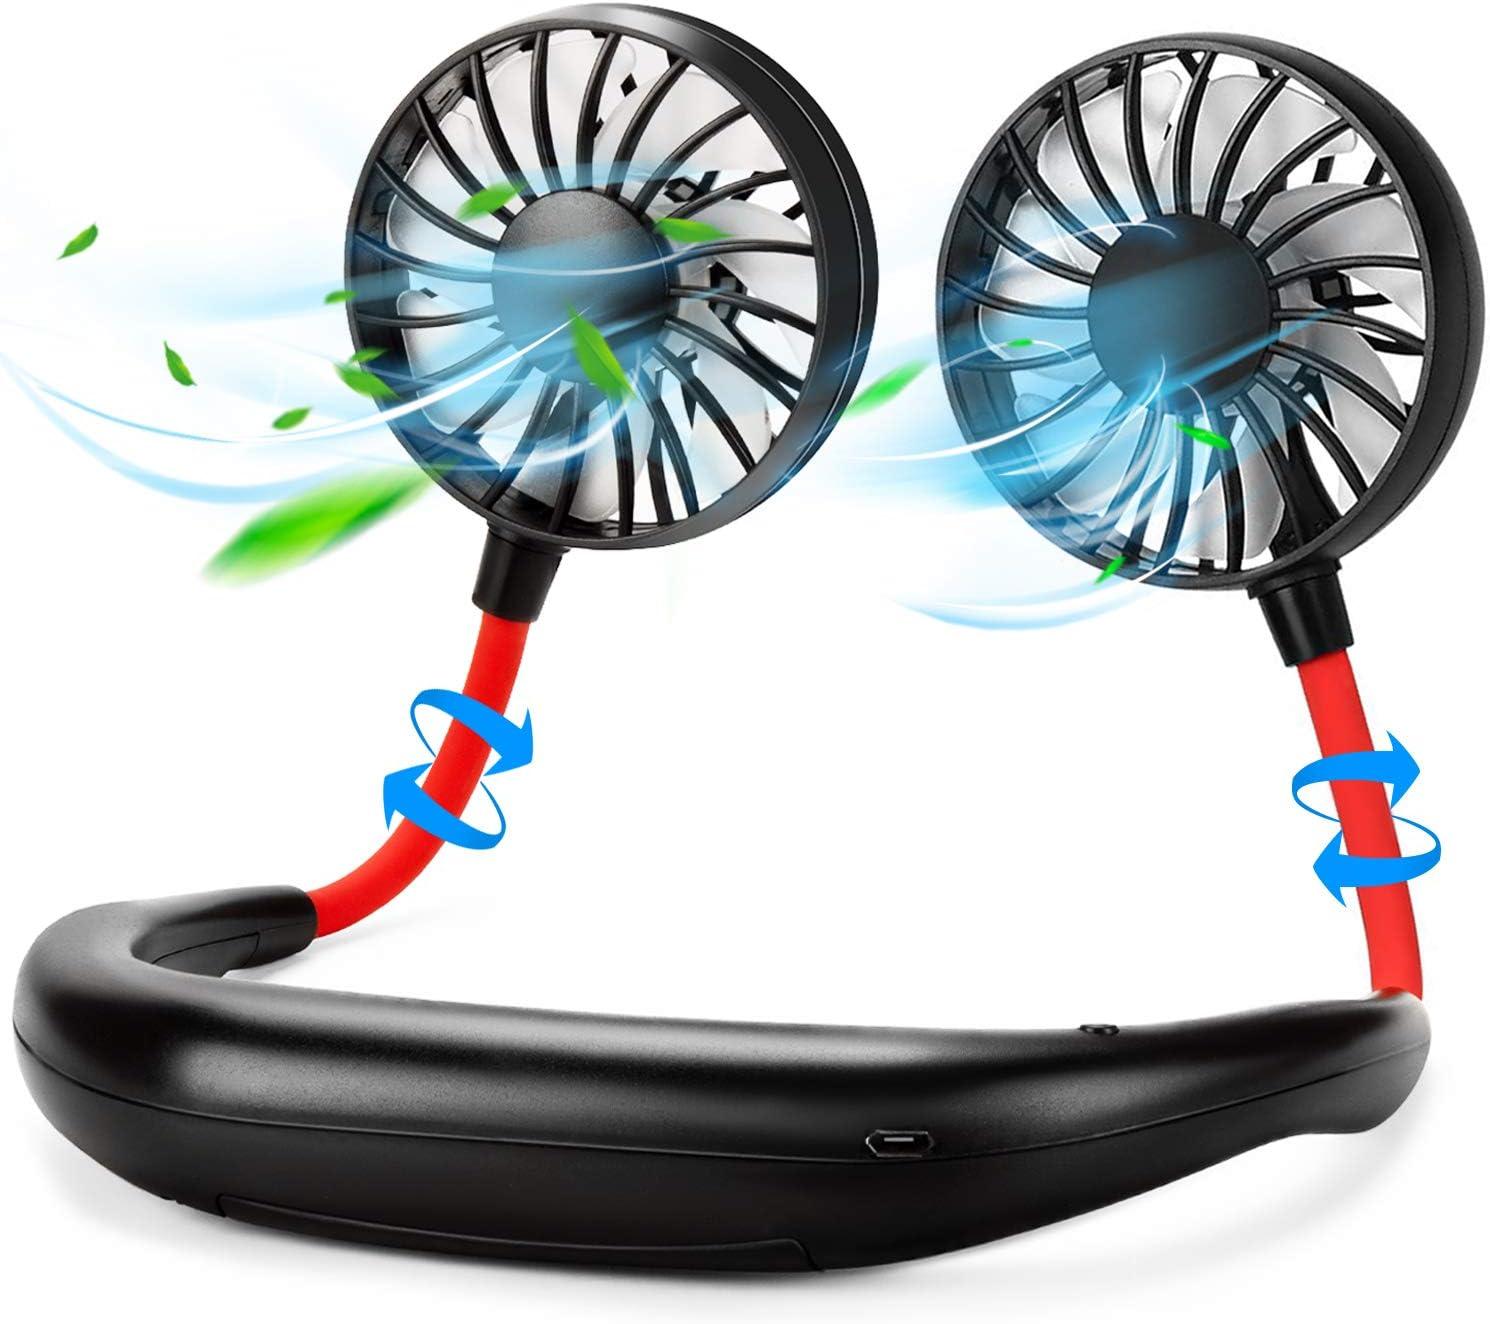 Portable Neck Fan Hand Free Personal Mini Fans USB neck hang fan, 360 Degree Free Rotation personal cooling fan handheld portable fans,Wearable neck fan Suitable for Traveling ,Sports, Office(Black)